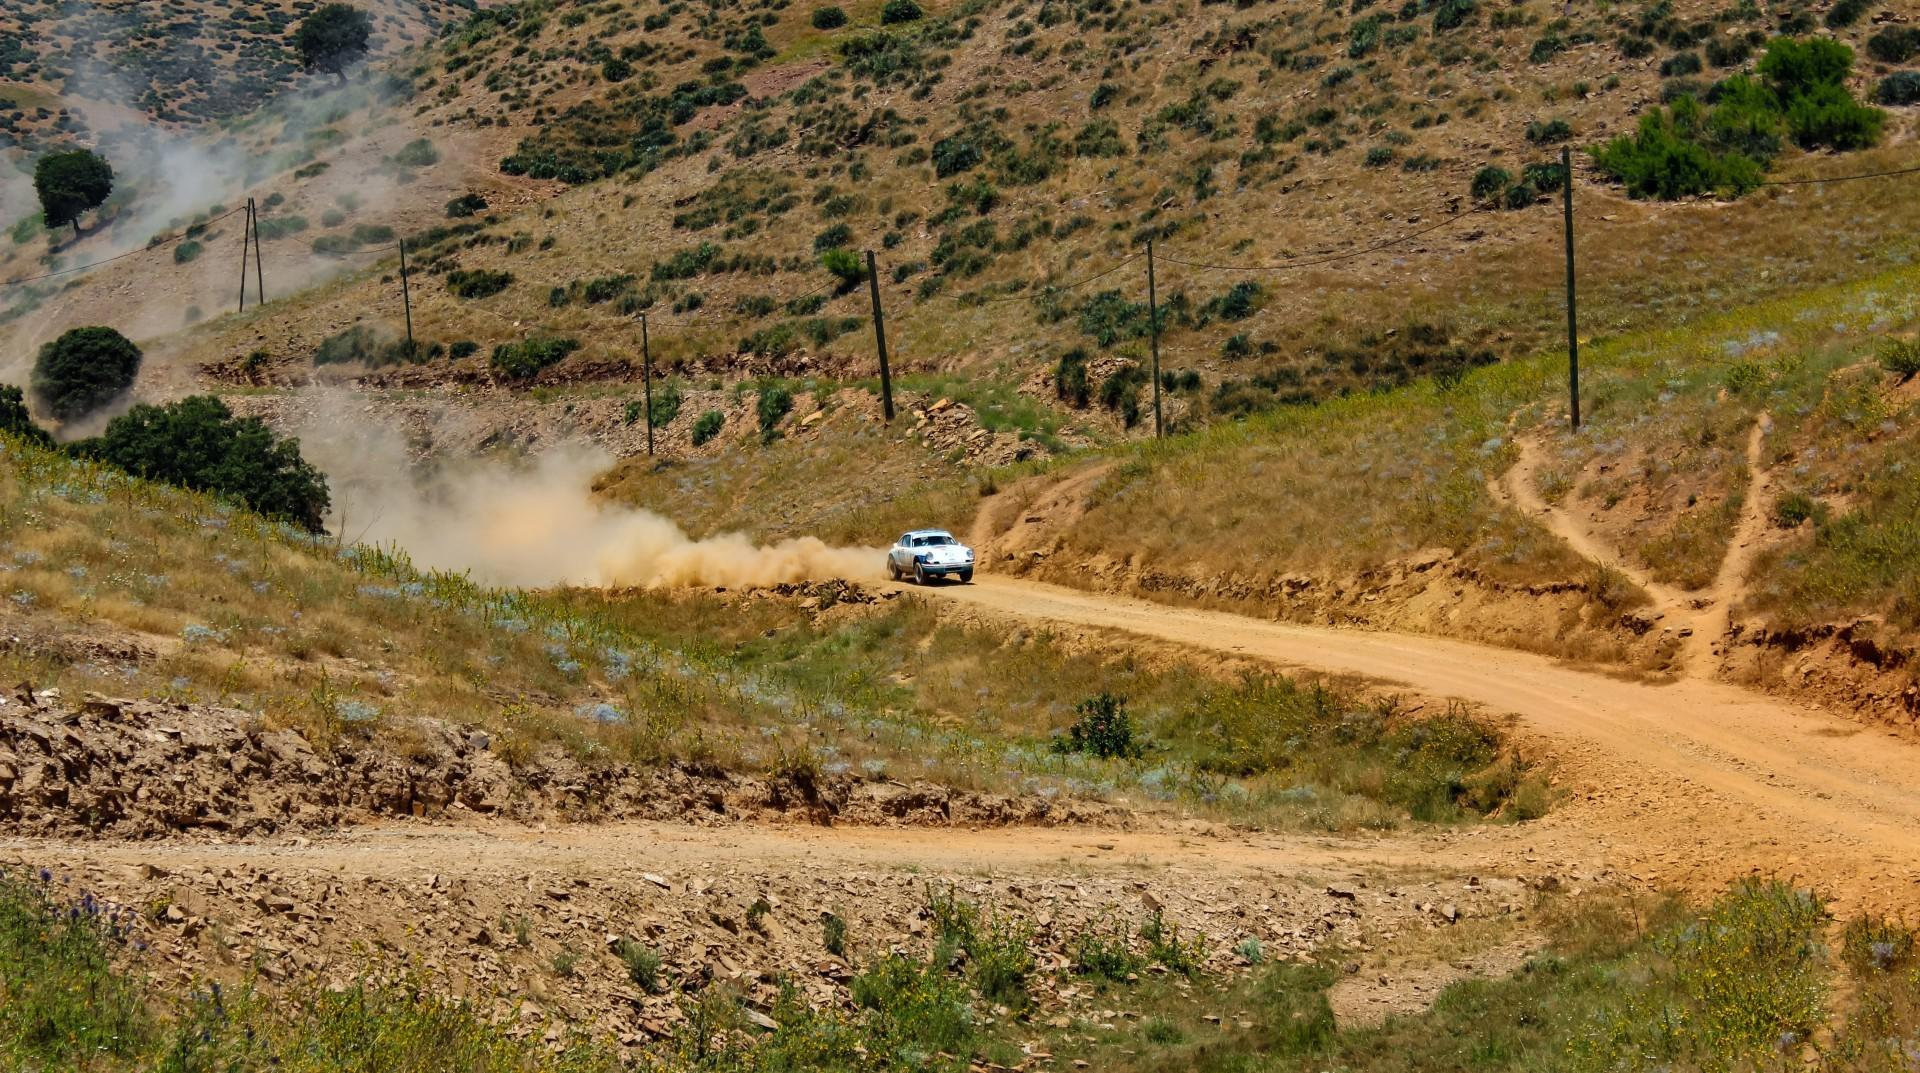 Maroc Historic Rally (MHR) 2018 : Oreille toujours en tête